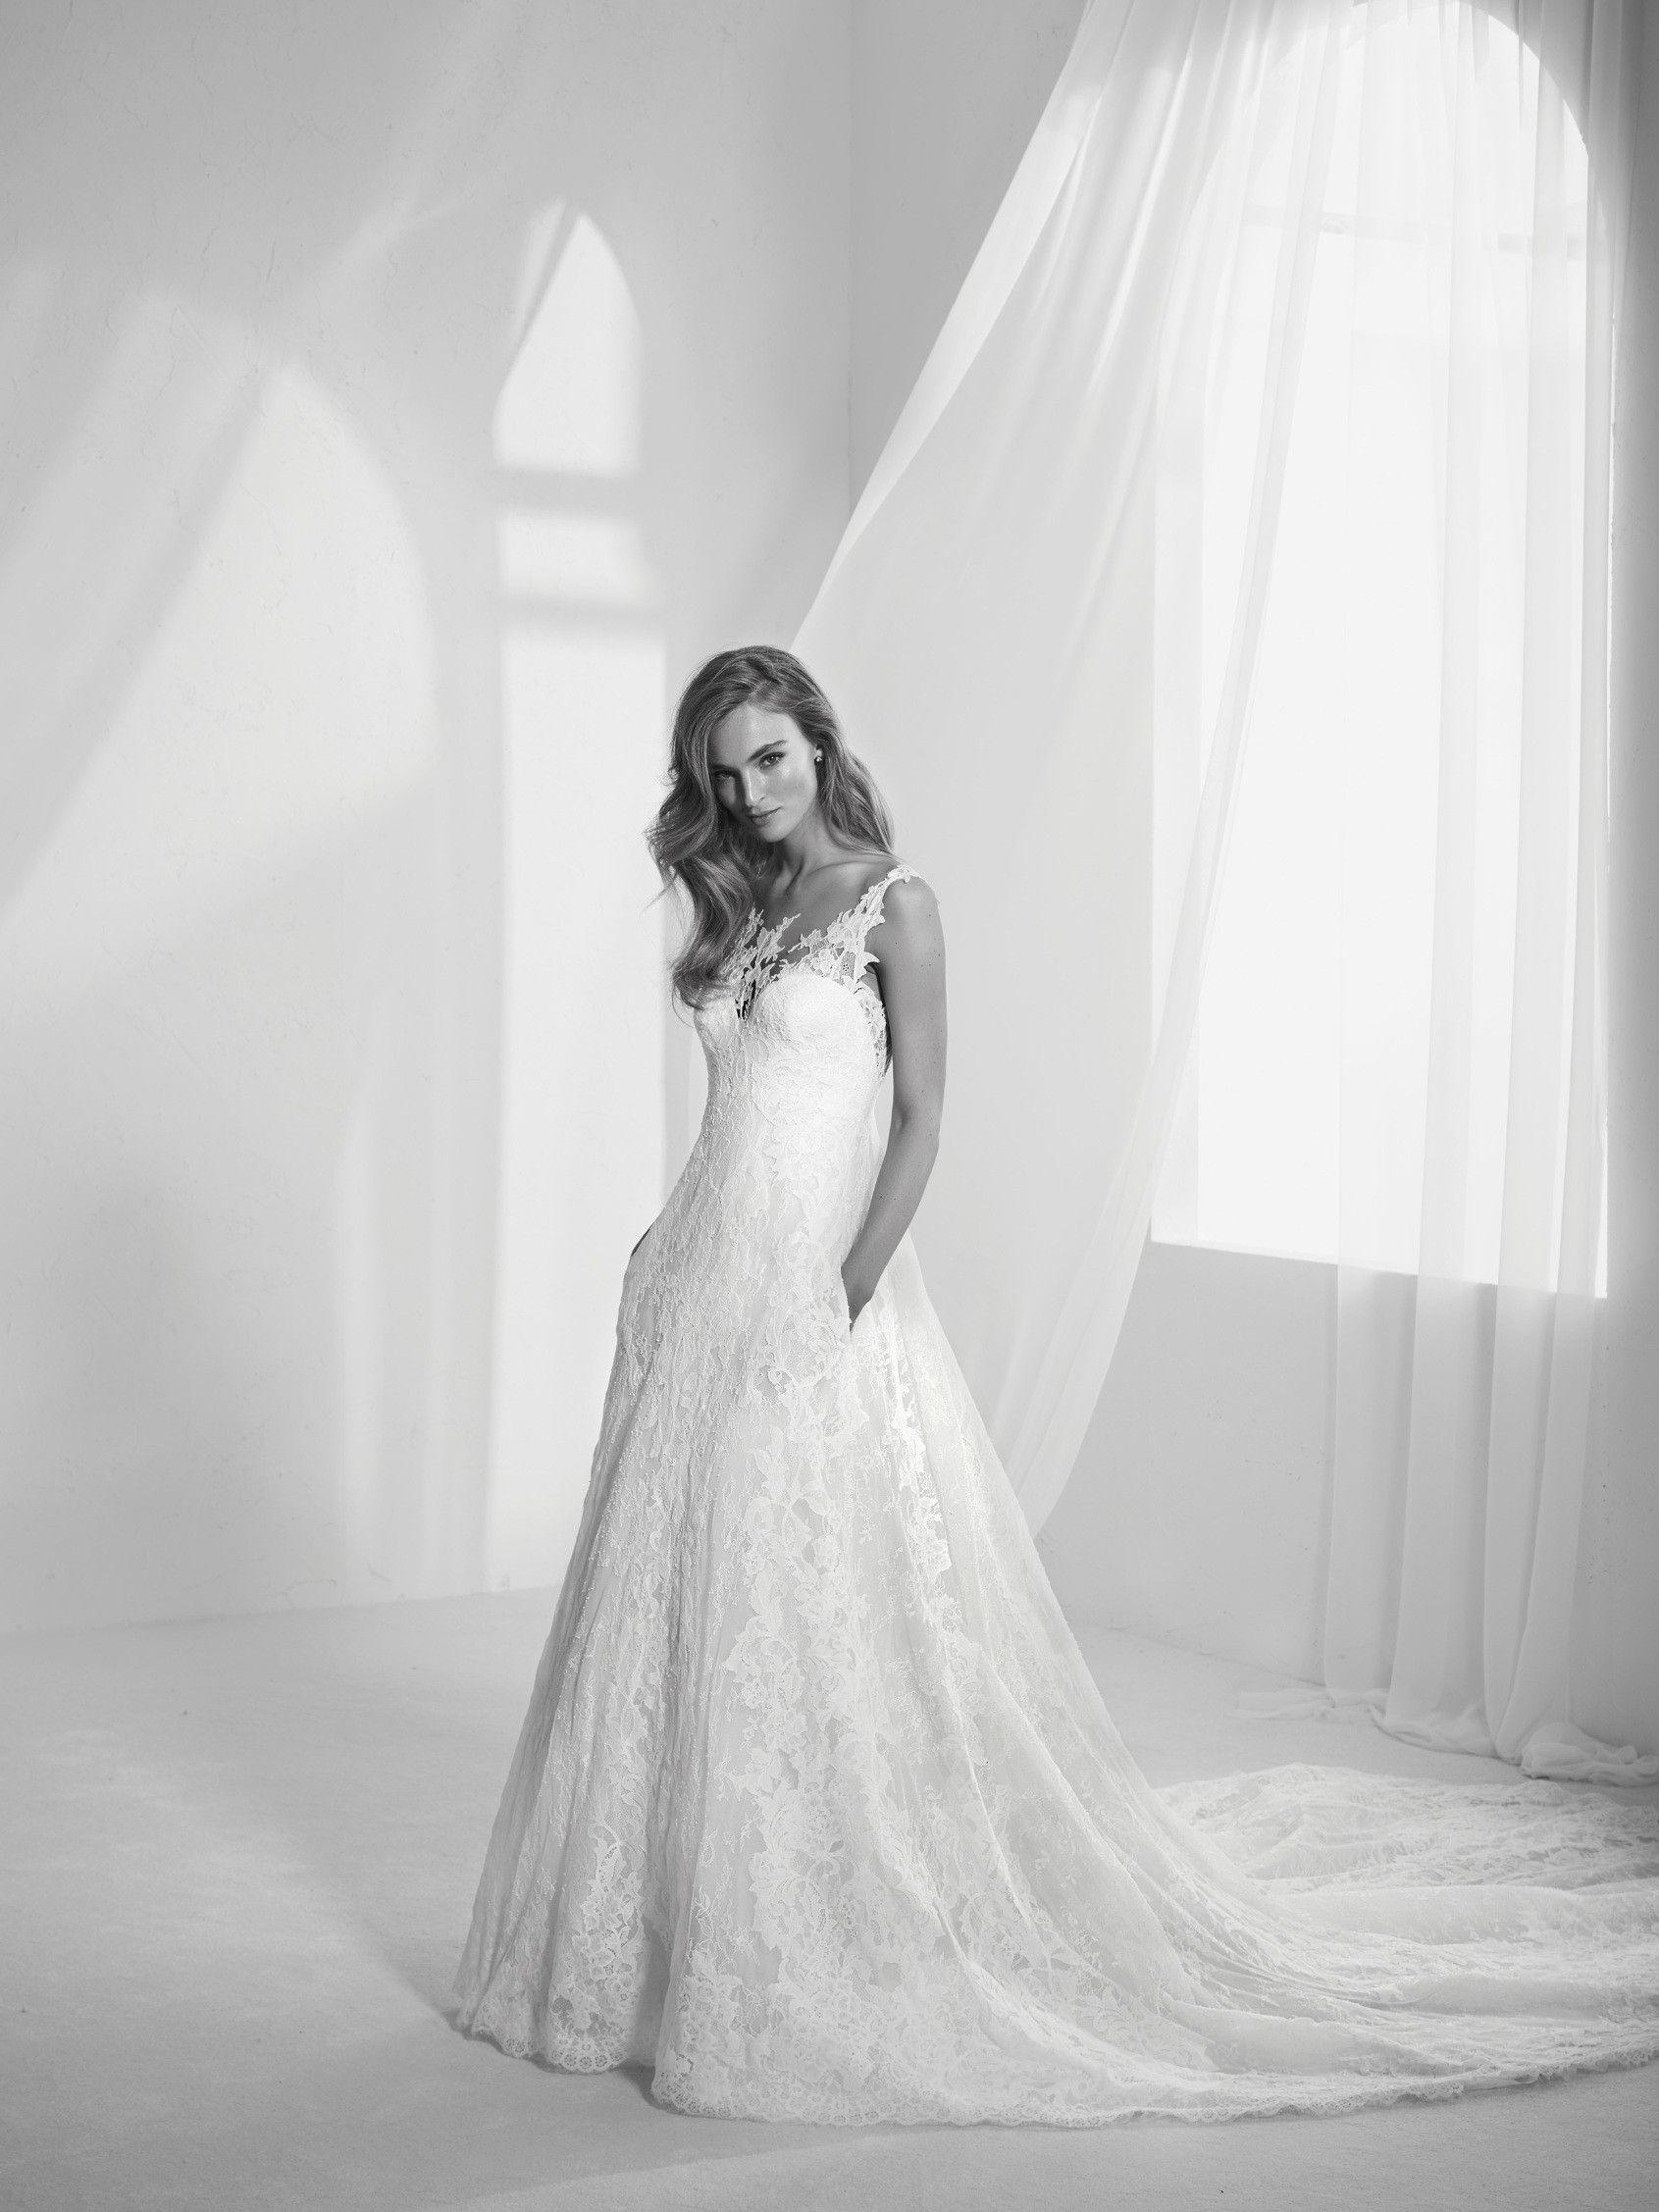 Lace wedding dress radila atelier pronovias just wedding